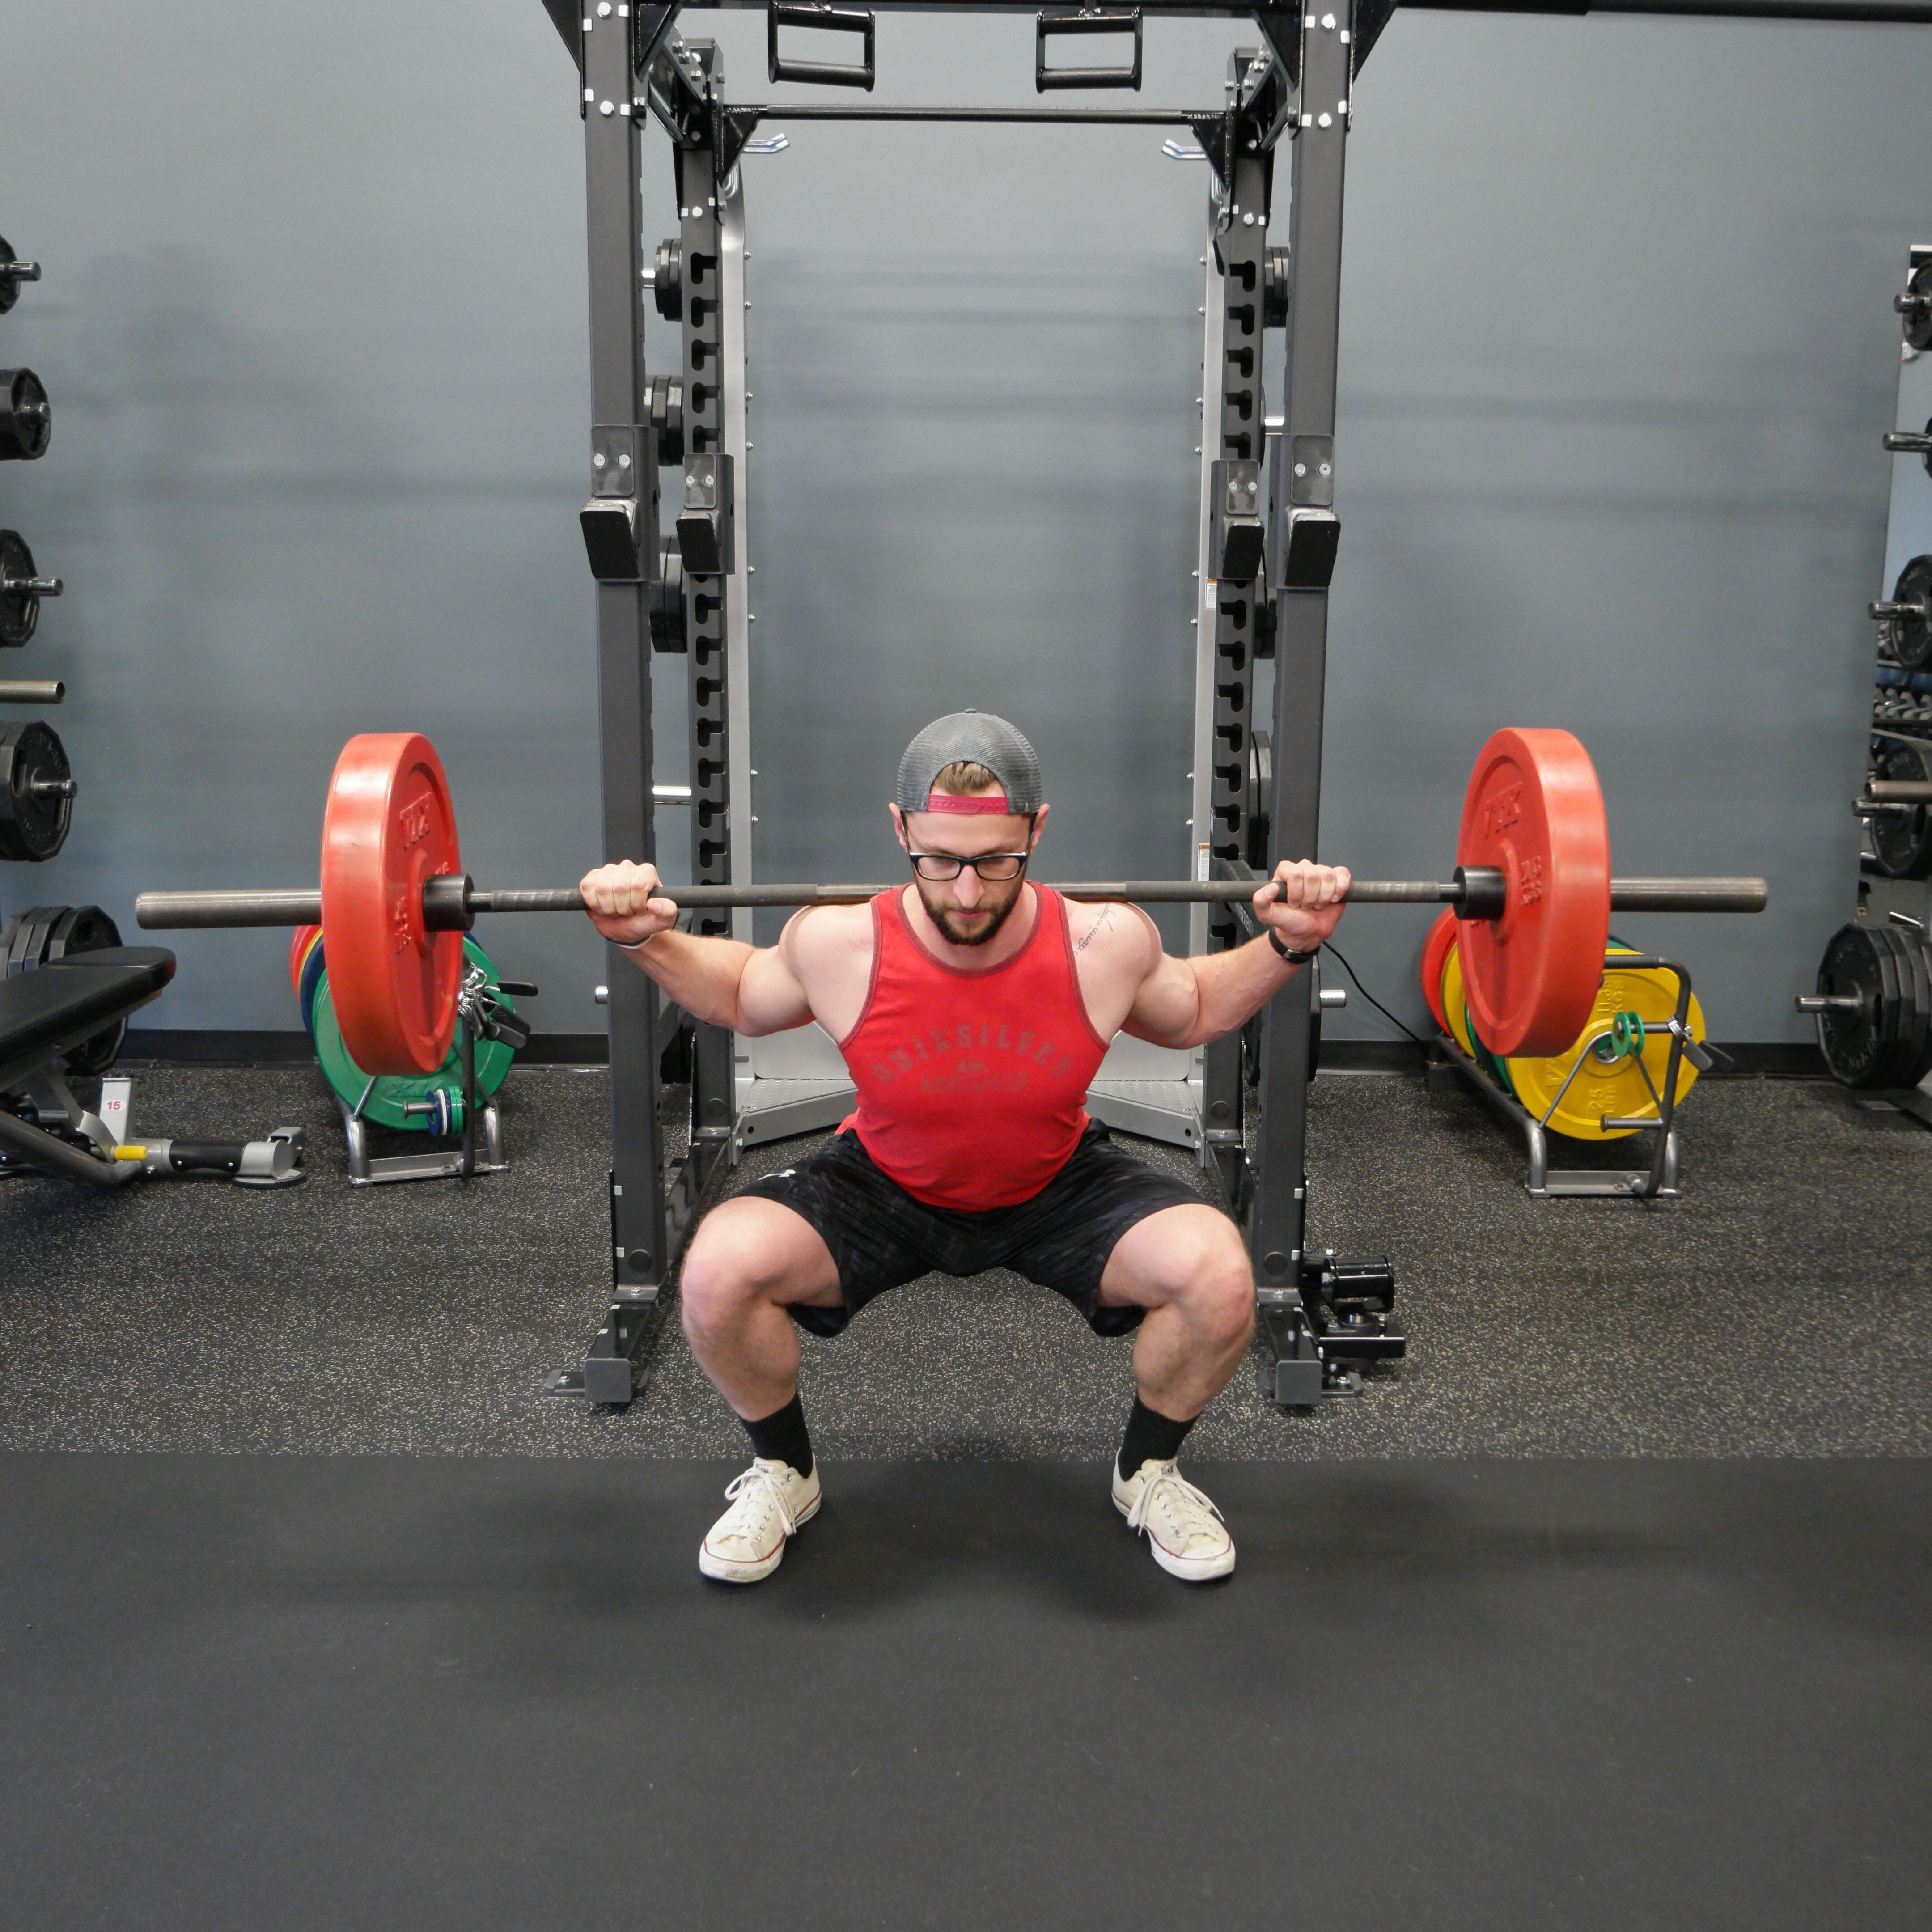 Squat Bottom Position